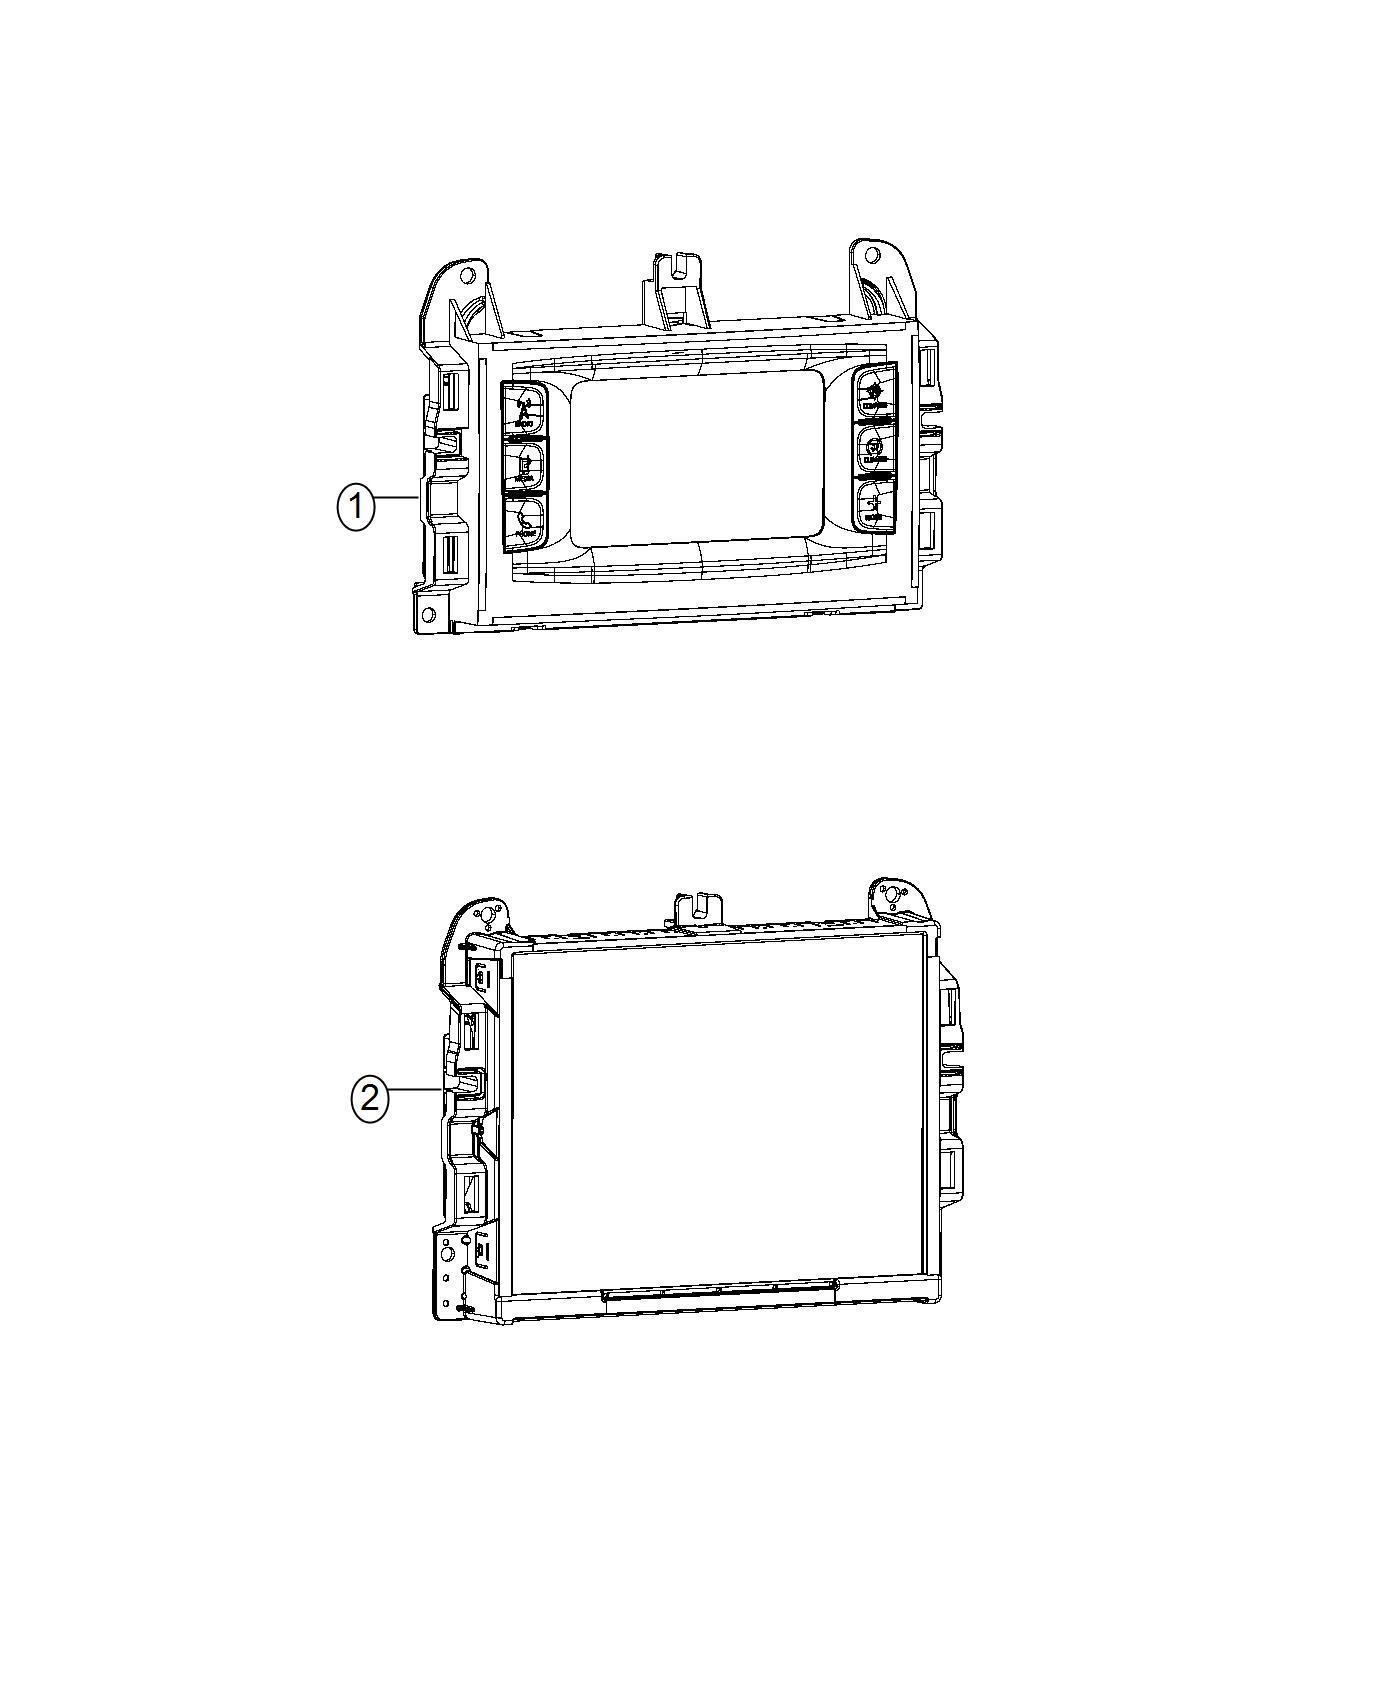 dodge durango radio multi media instrument panel parts. Black Bedroom Furniture Sets. Home Design Ideas